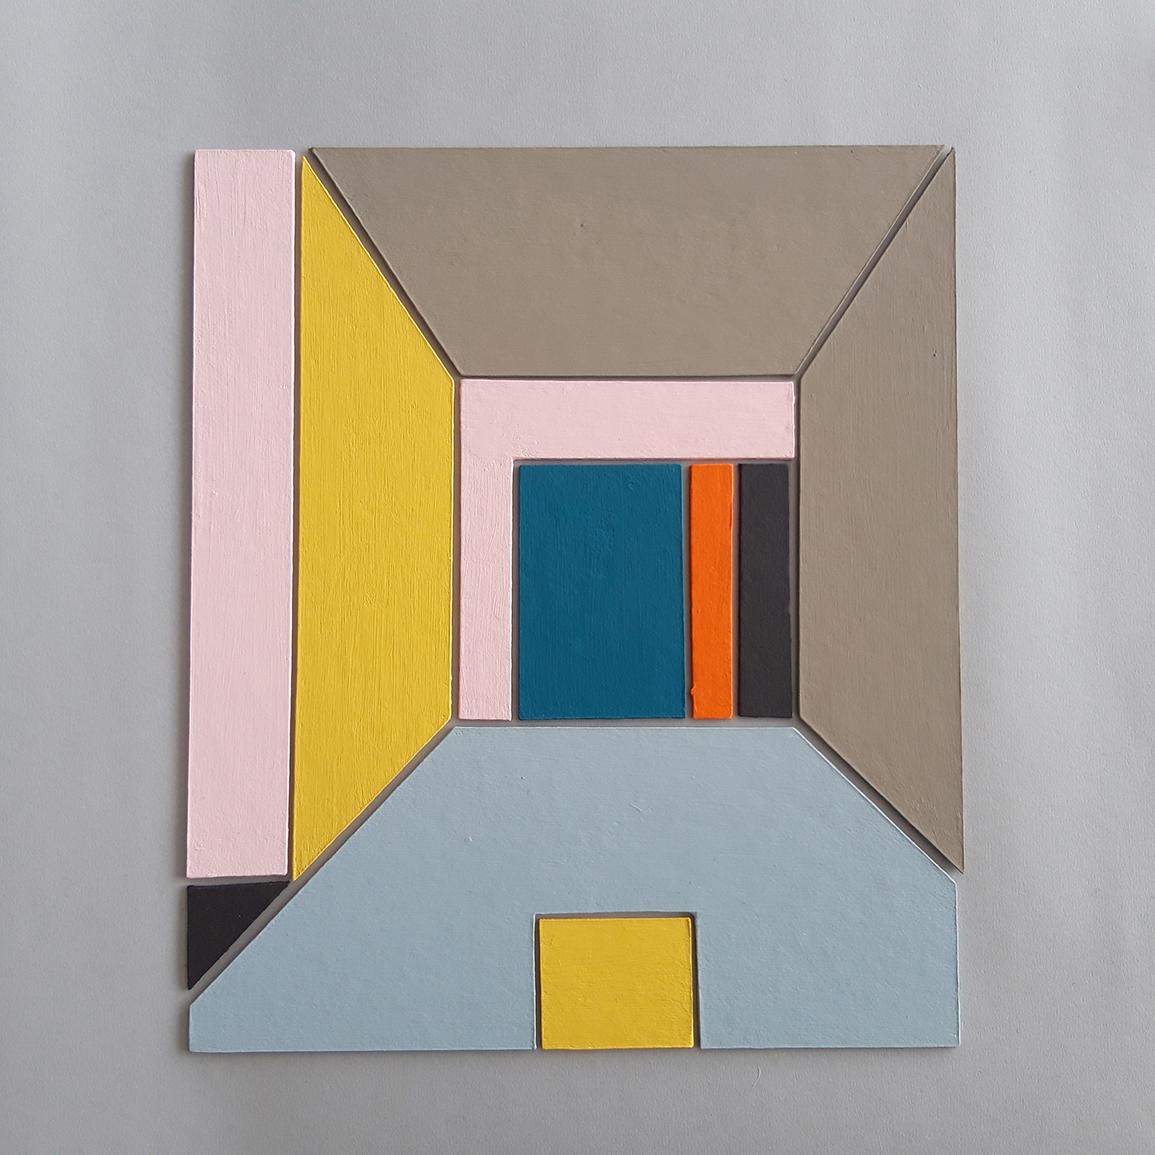 Eleanor_Pritchard_Fallingwater_shapes_2a.jpg